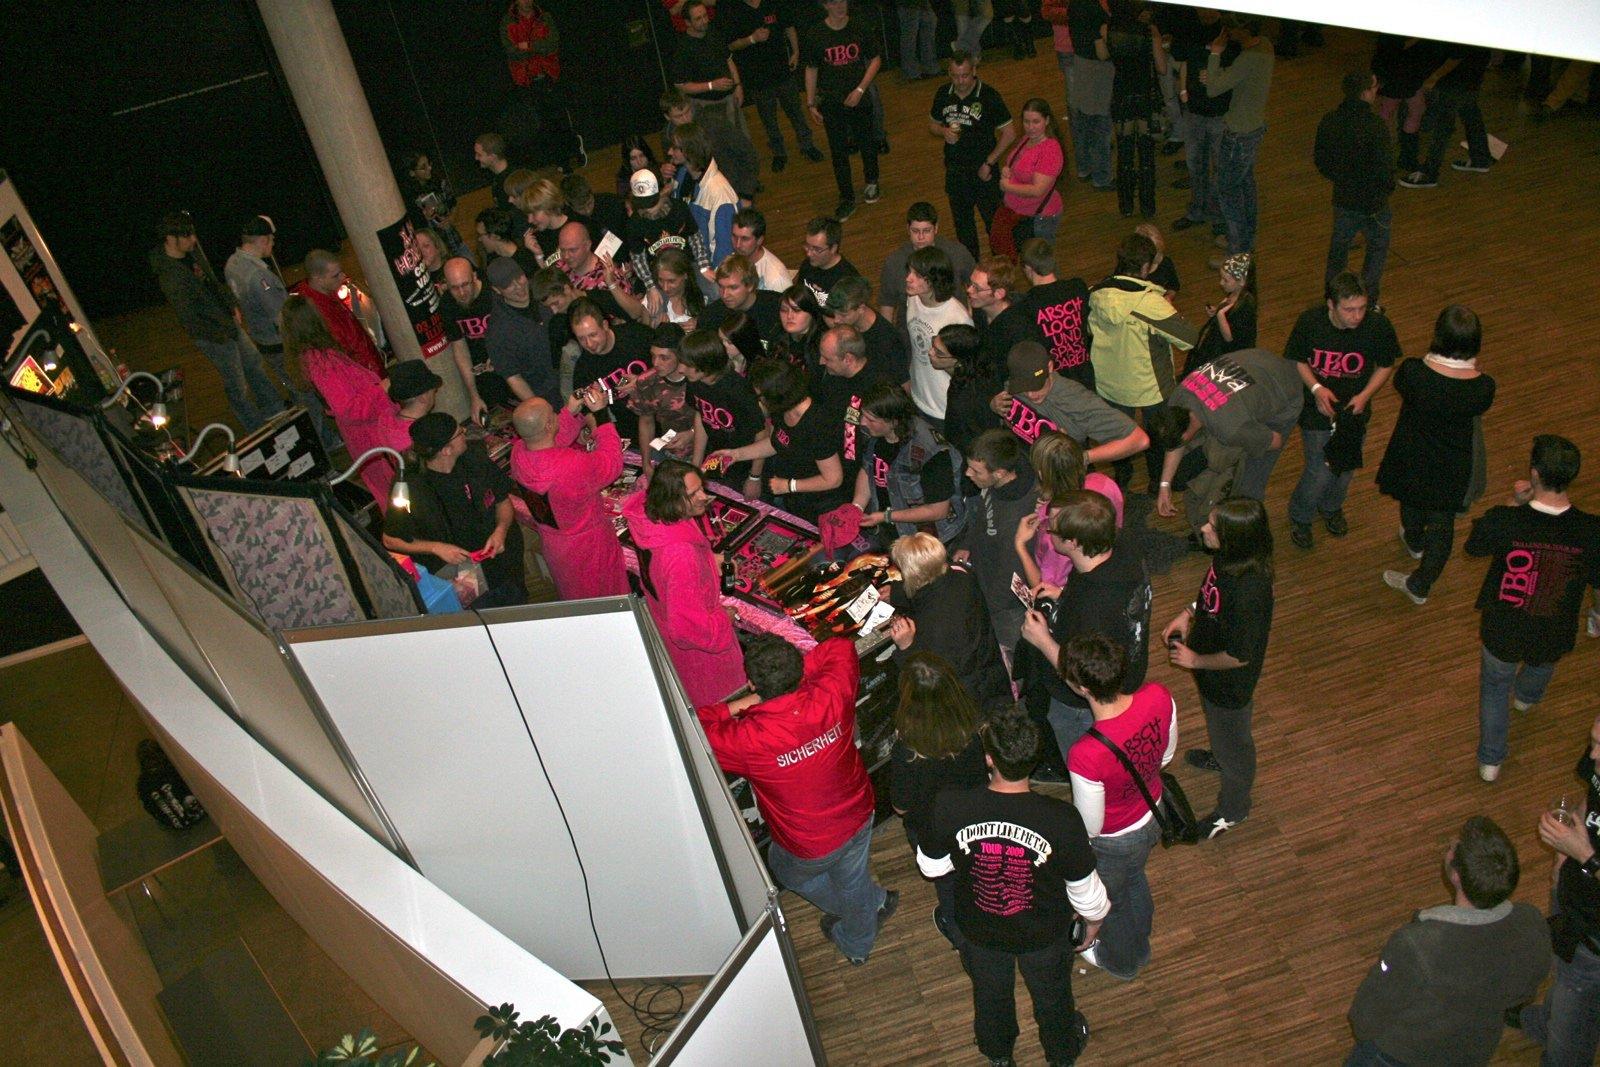 J.B.O. - Illingen - 27.11.2010 - 201